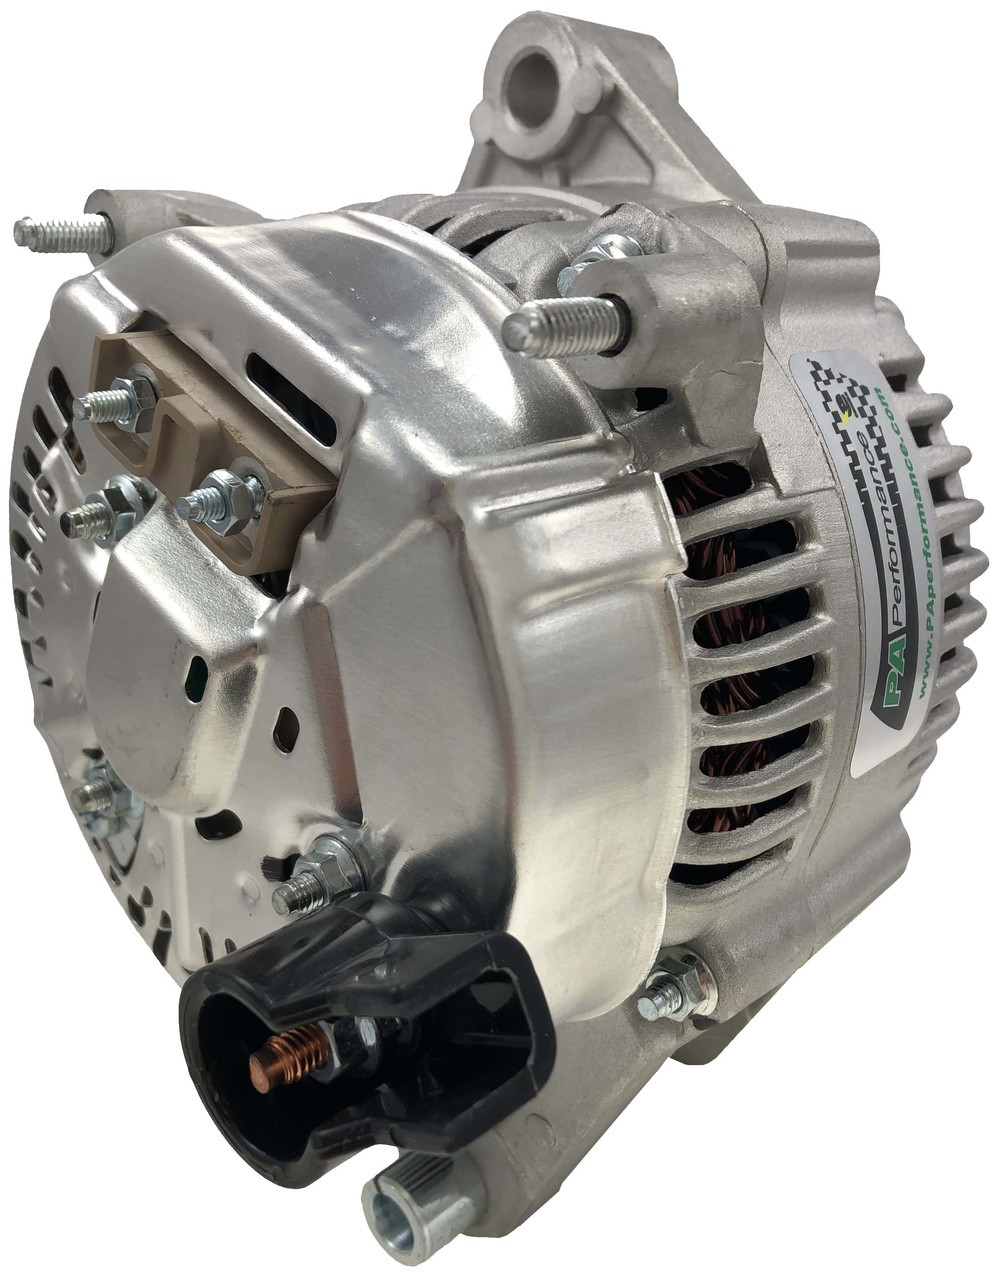 [ZTBE_9966]  Nippondenso Alternator 5.9 Cummins (2807) | Denso Alternator Wiring Jeep |  | PA Performance